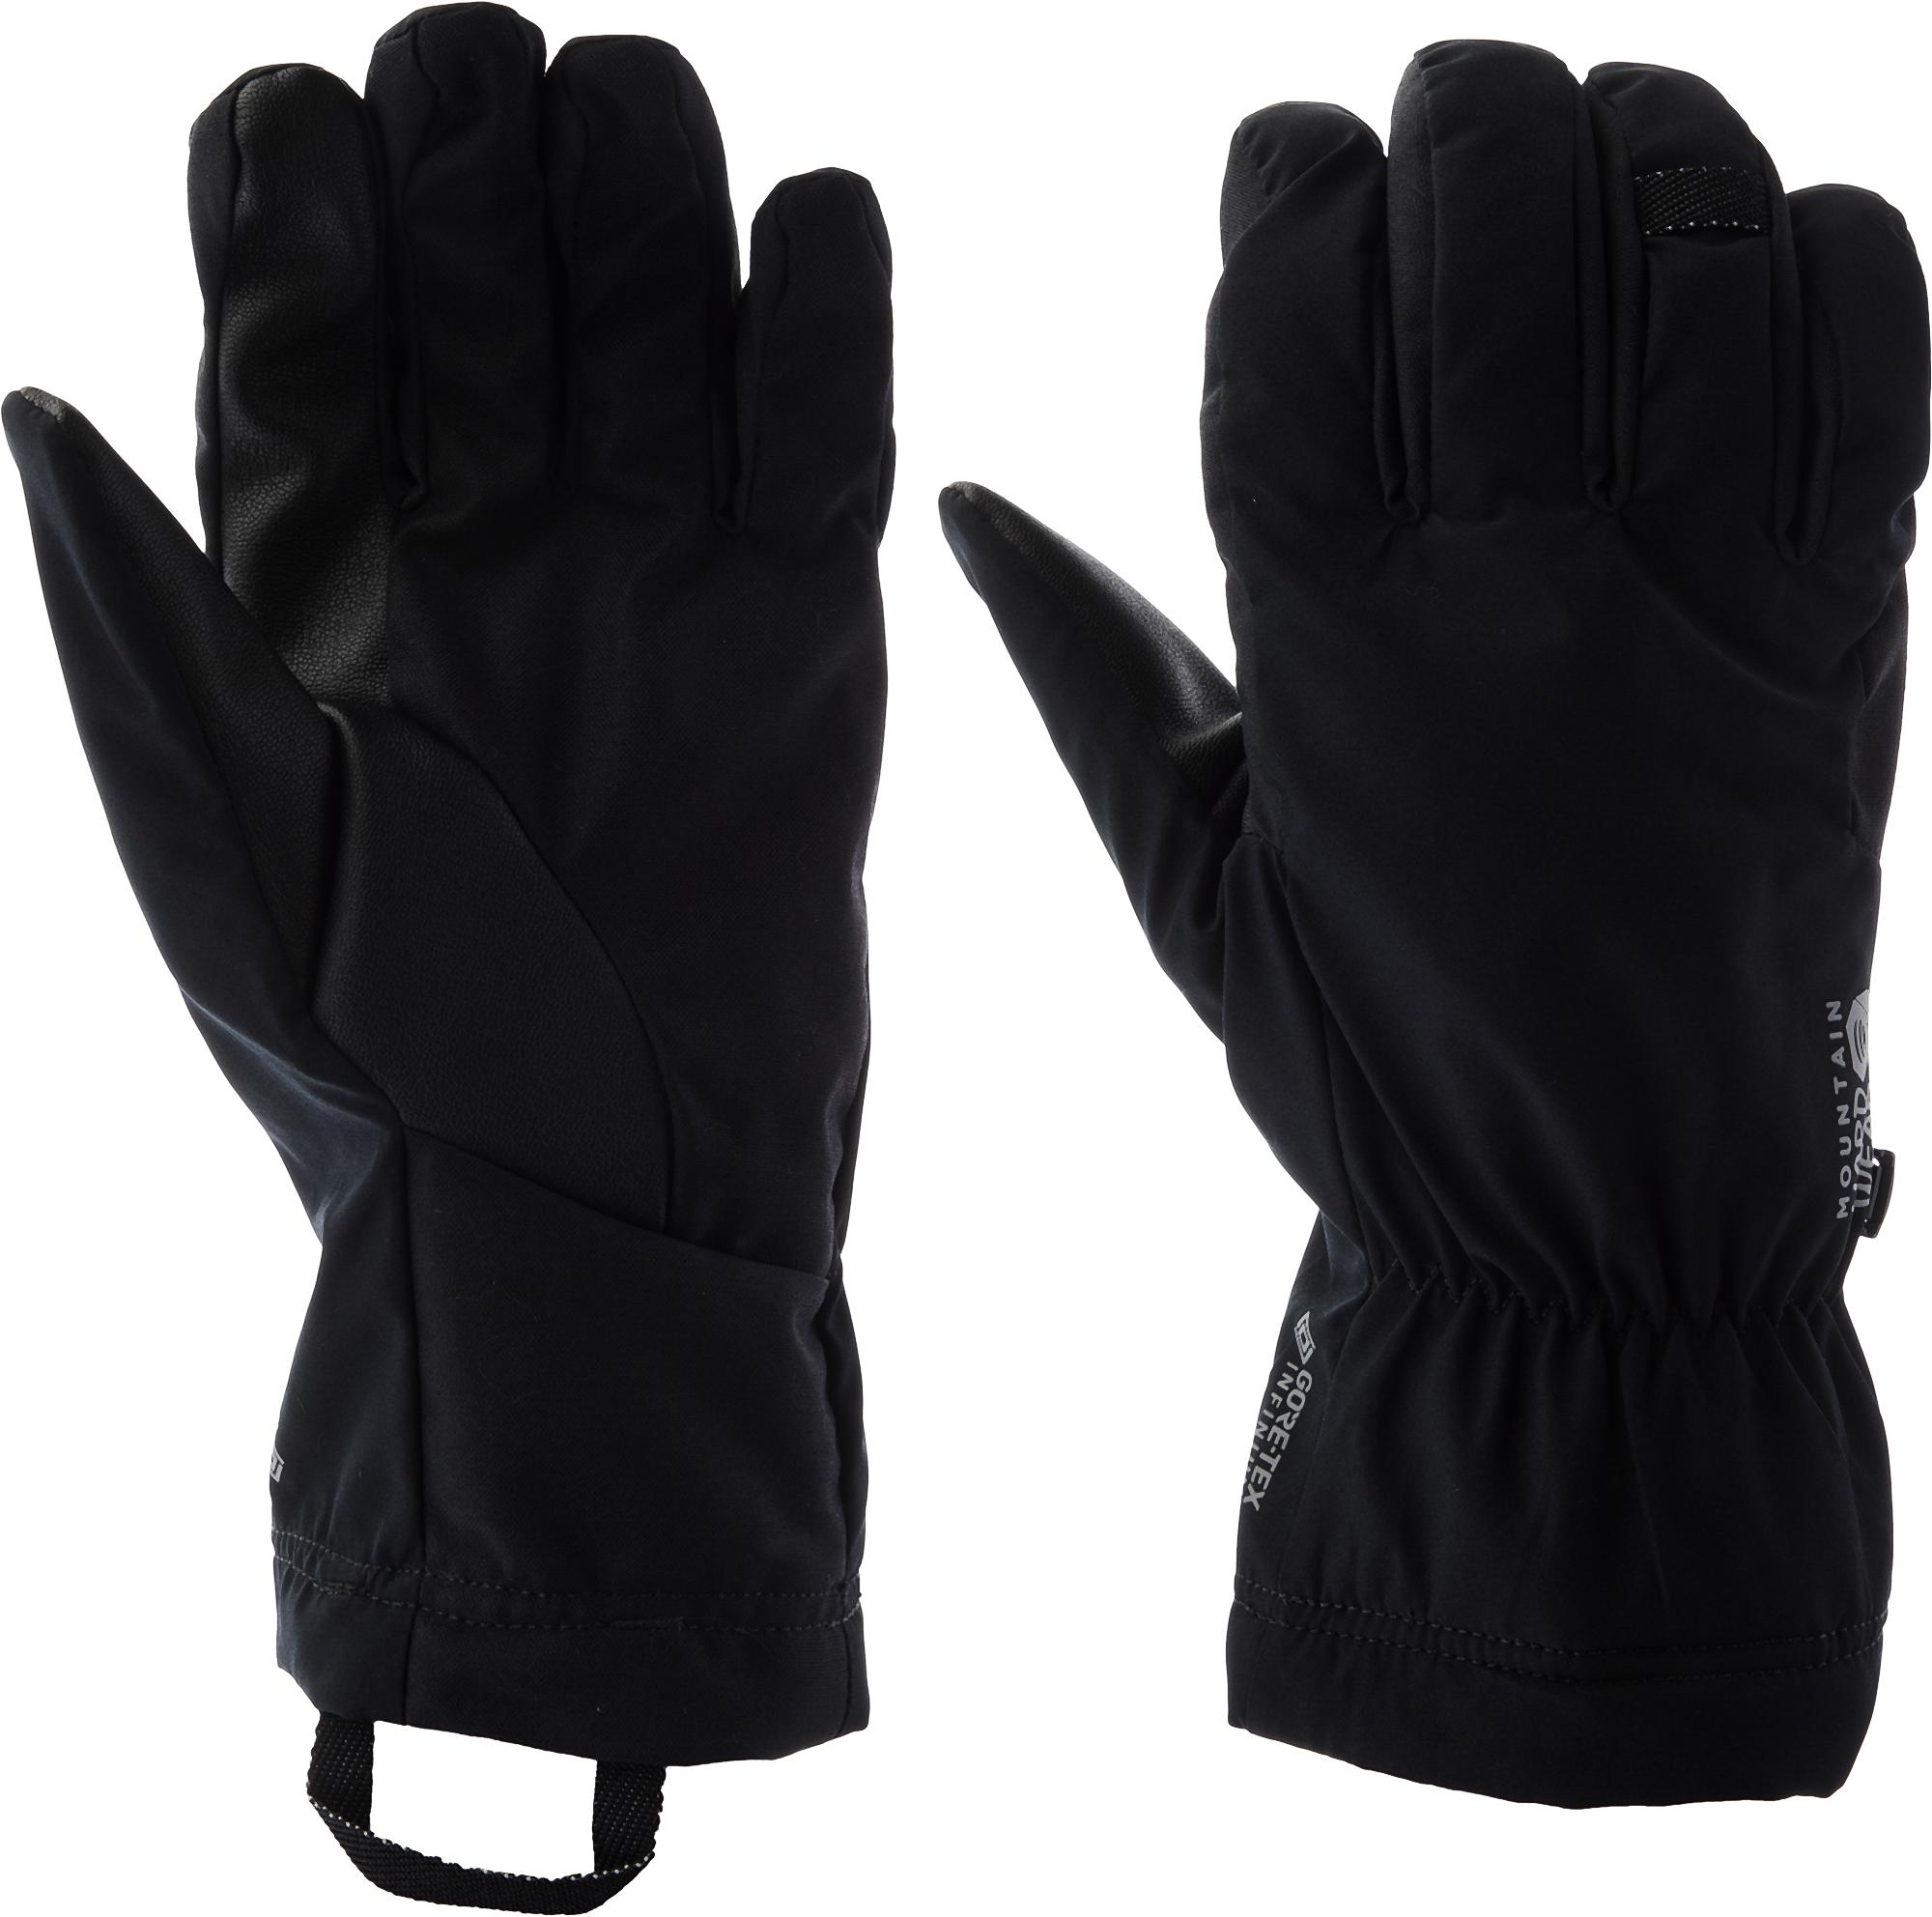 Mountain Hardwear Перчатки Rotor™ Gore-Tex Infinium™, размер 9,5-10